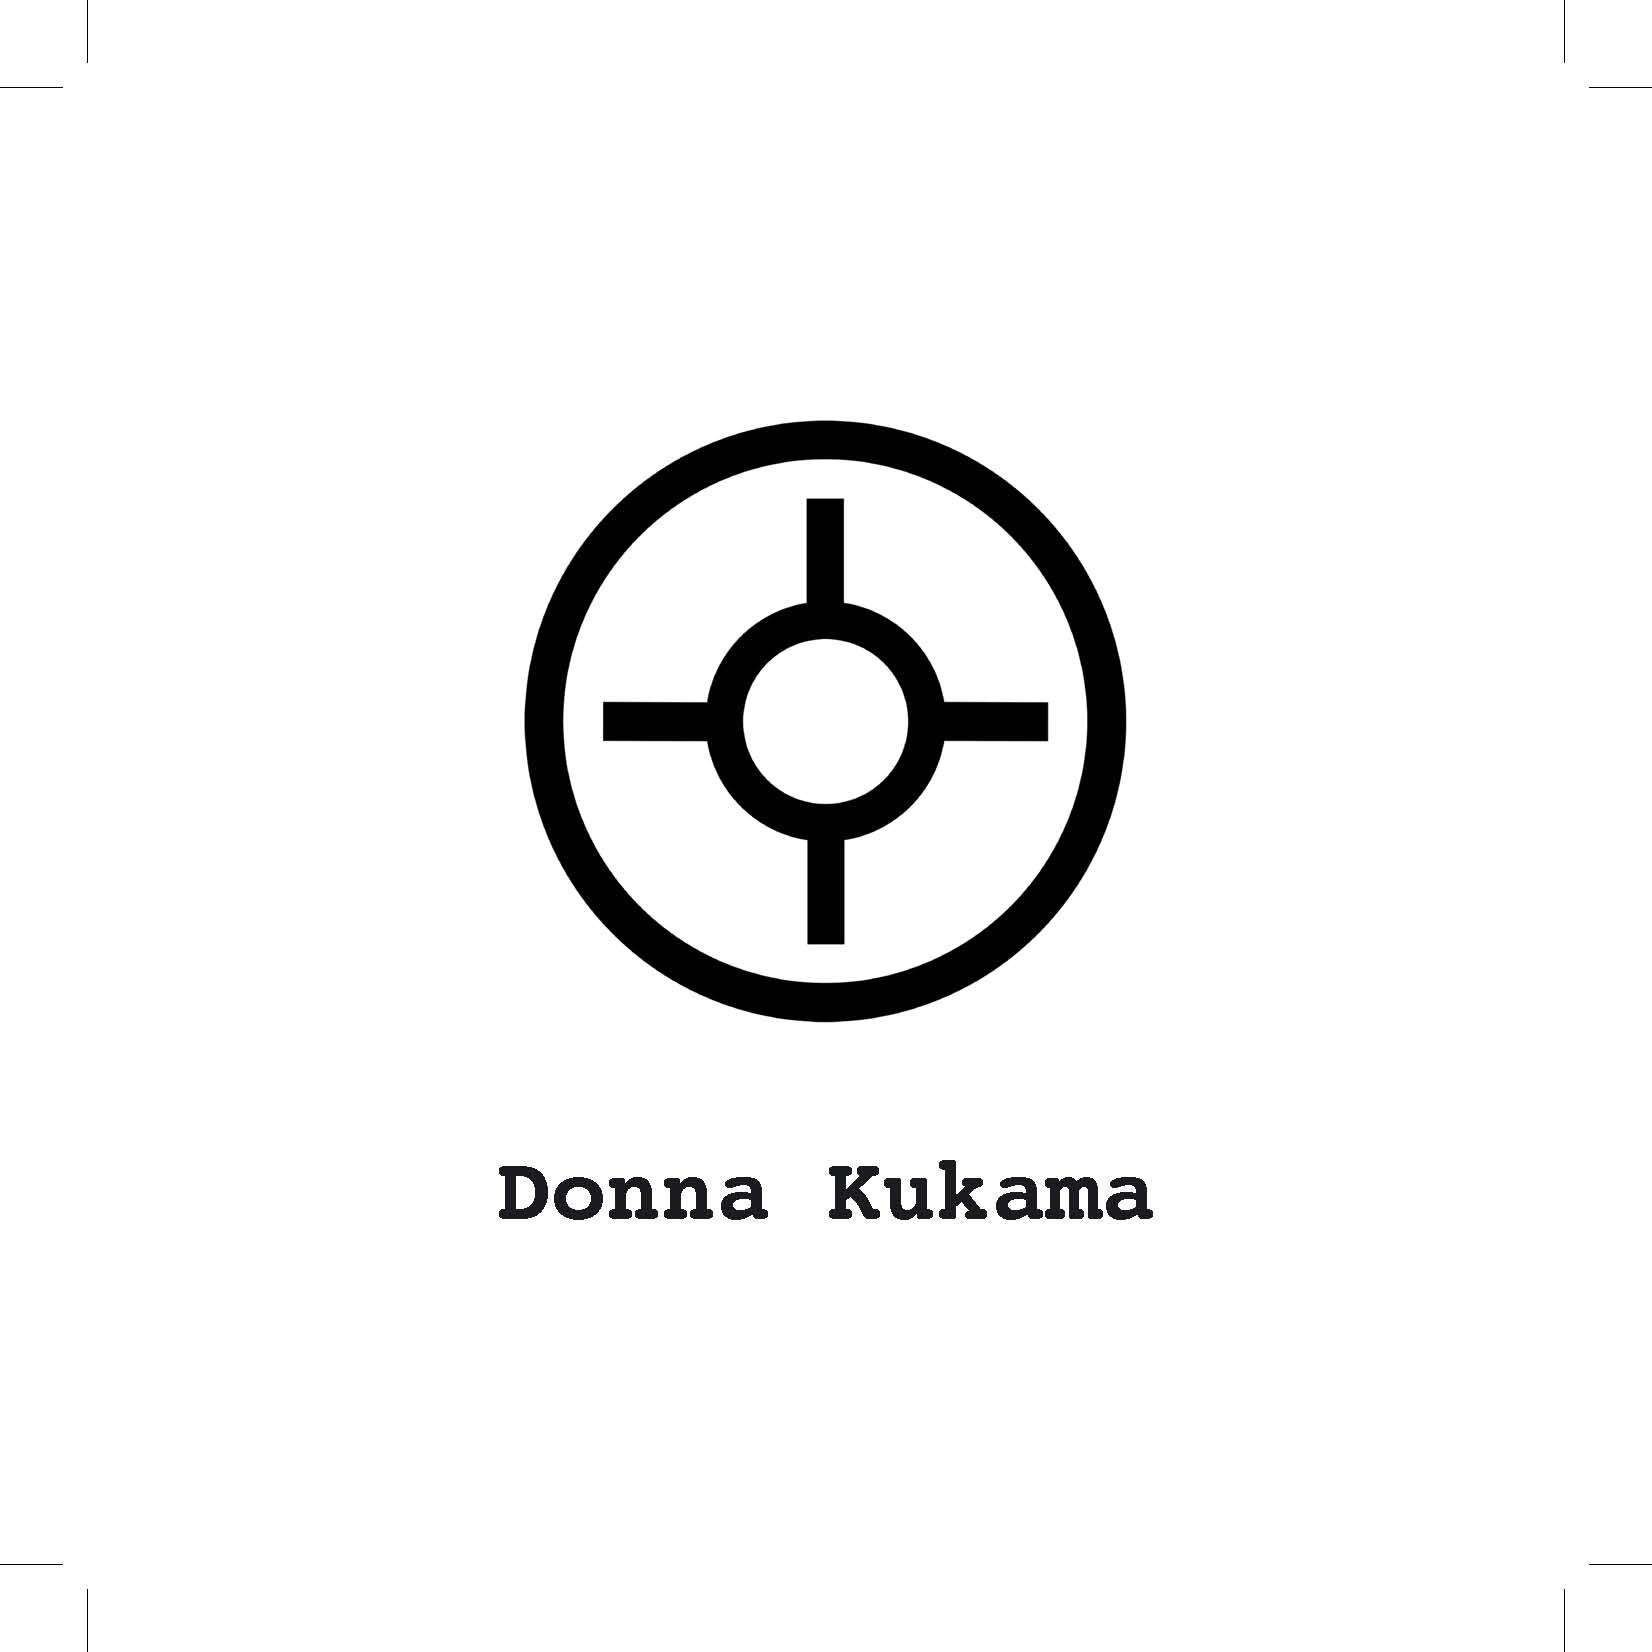 MAP Southafrica - Donna Kukama